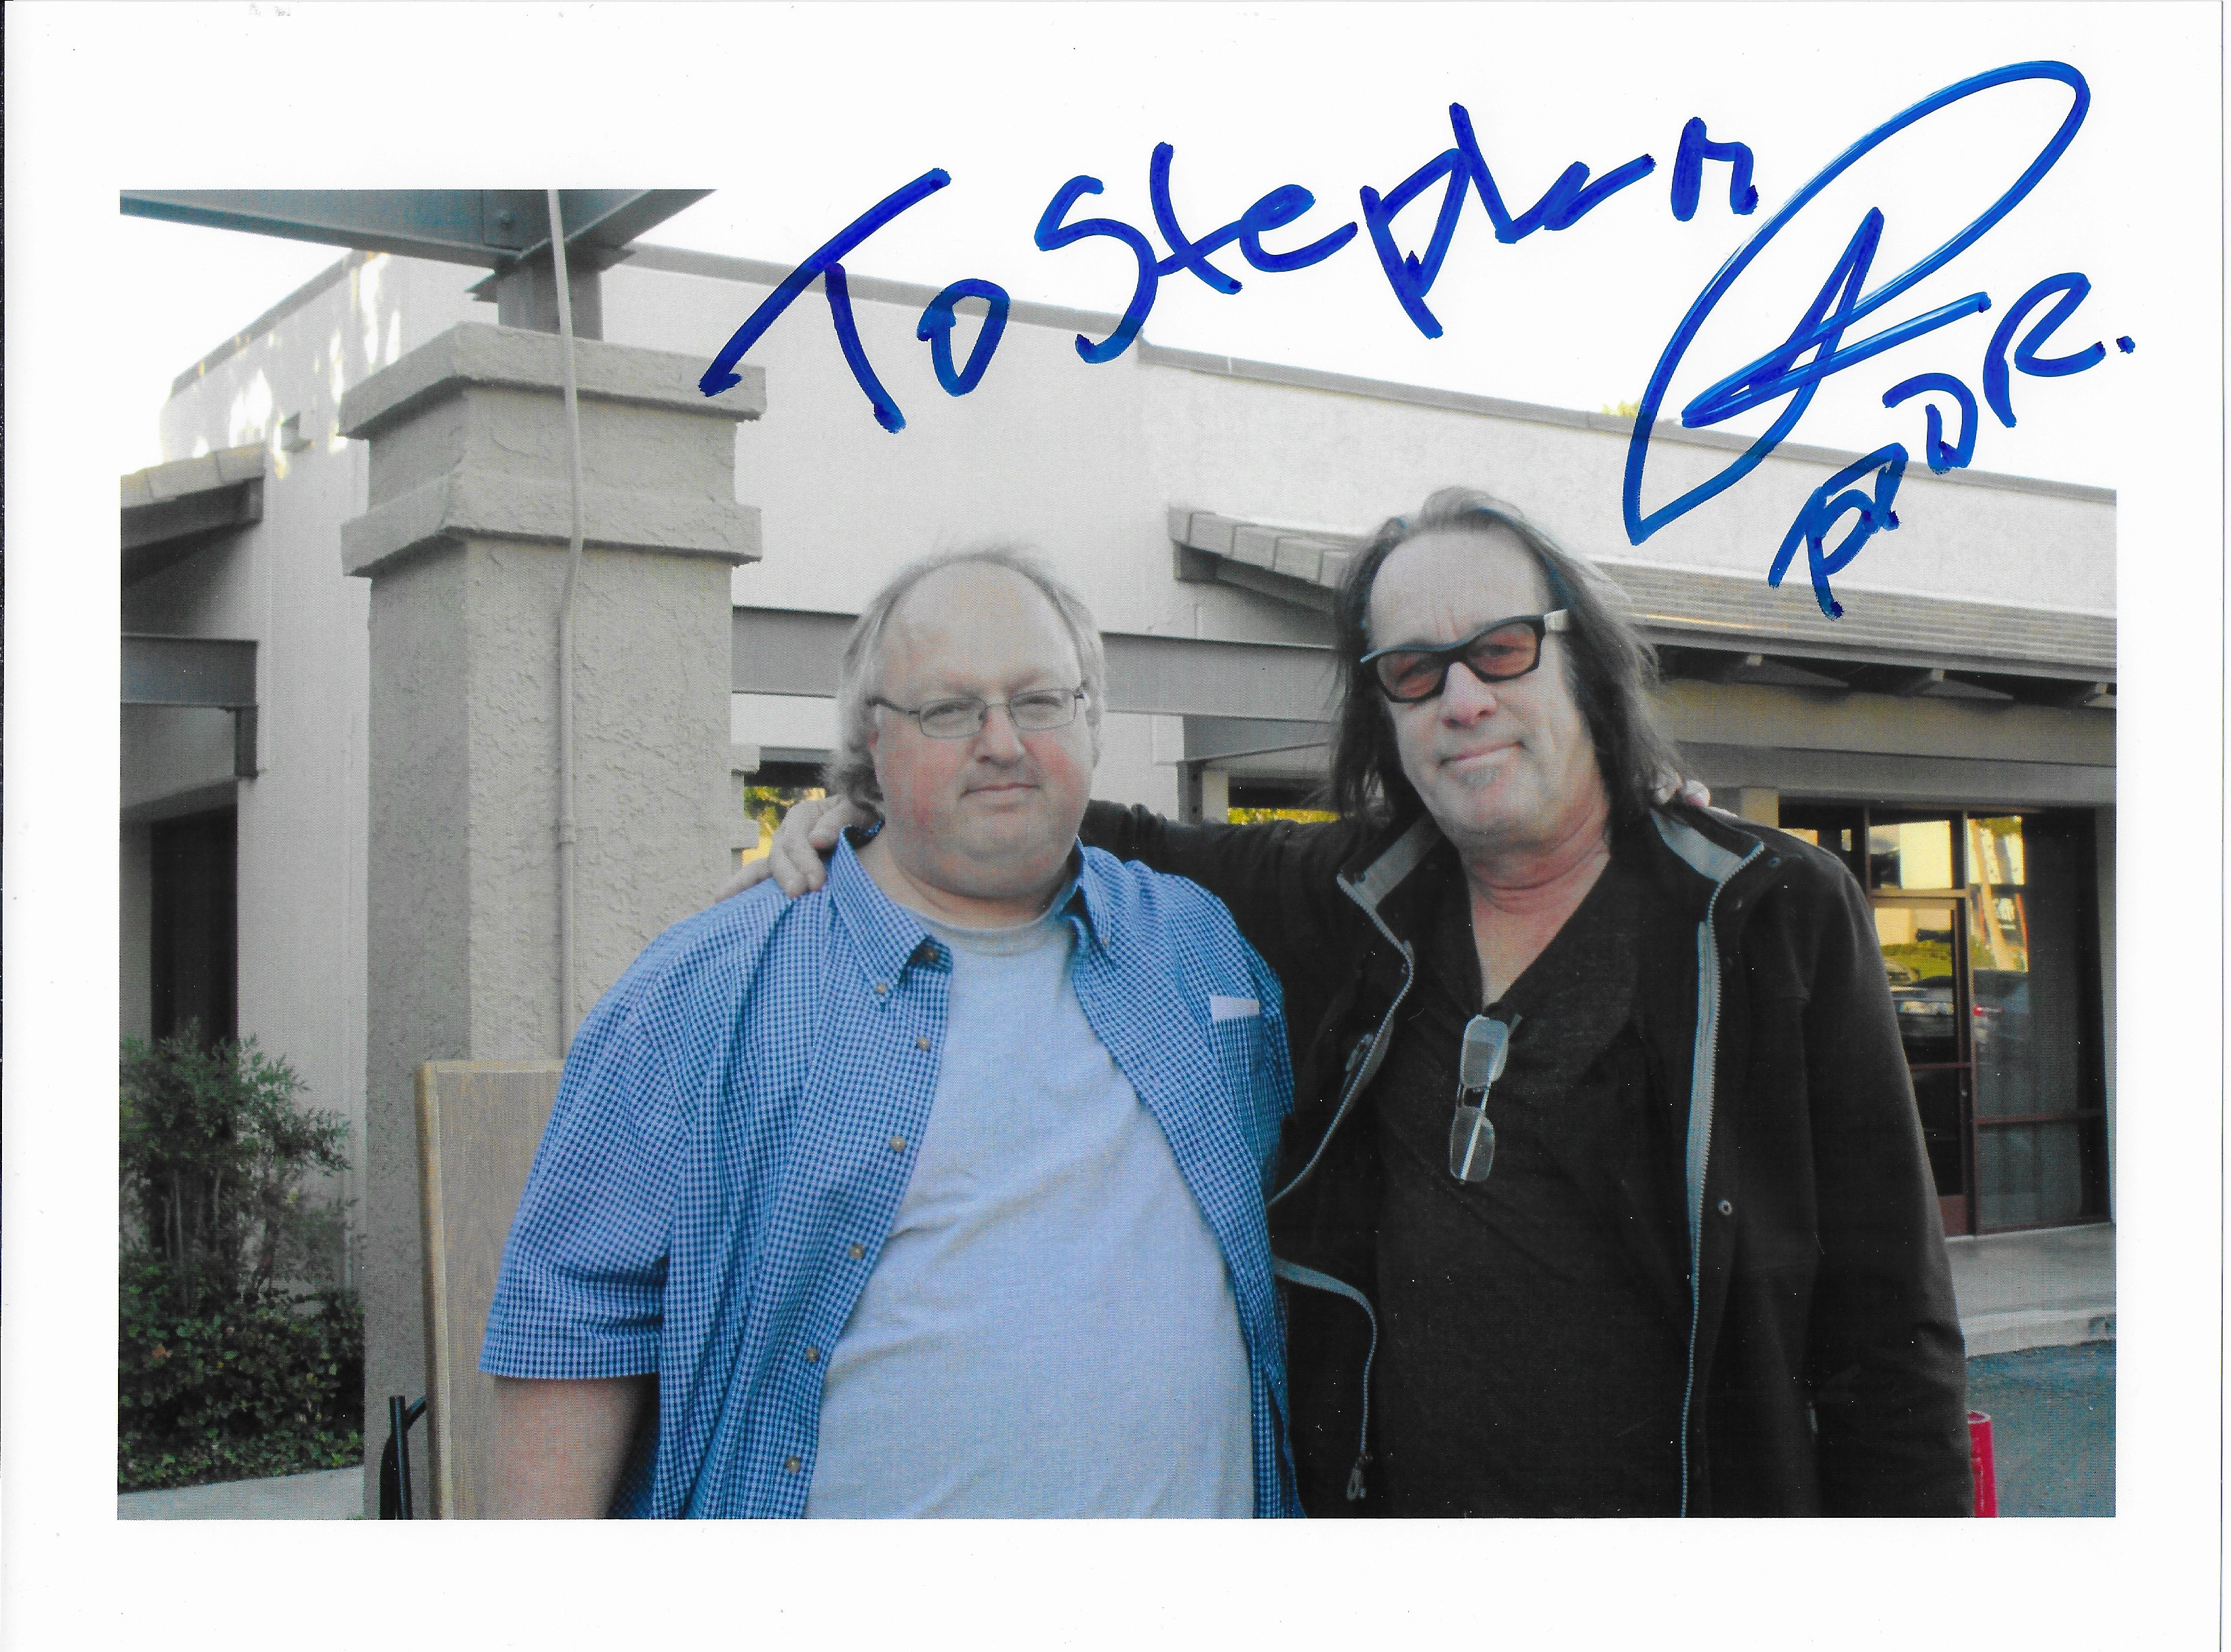 Photo - Stephen Duncan and Todd Rundgren